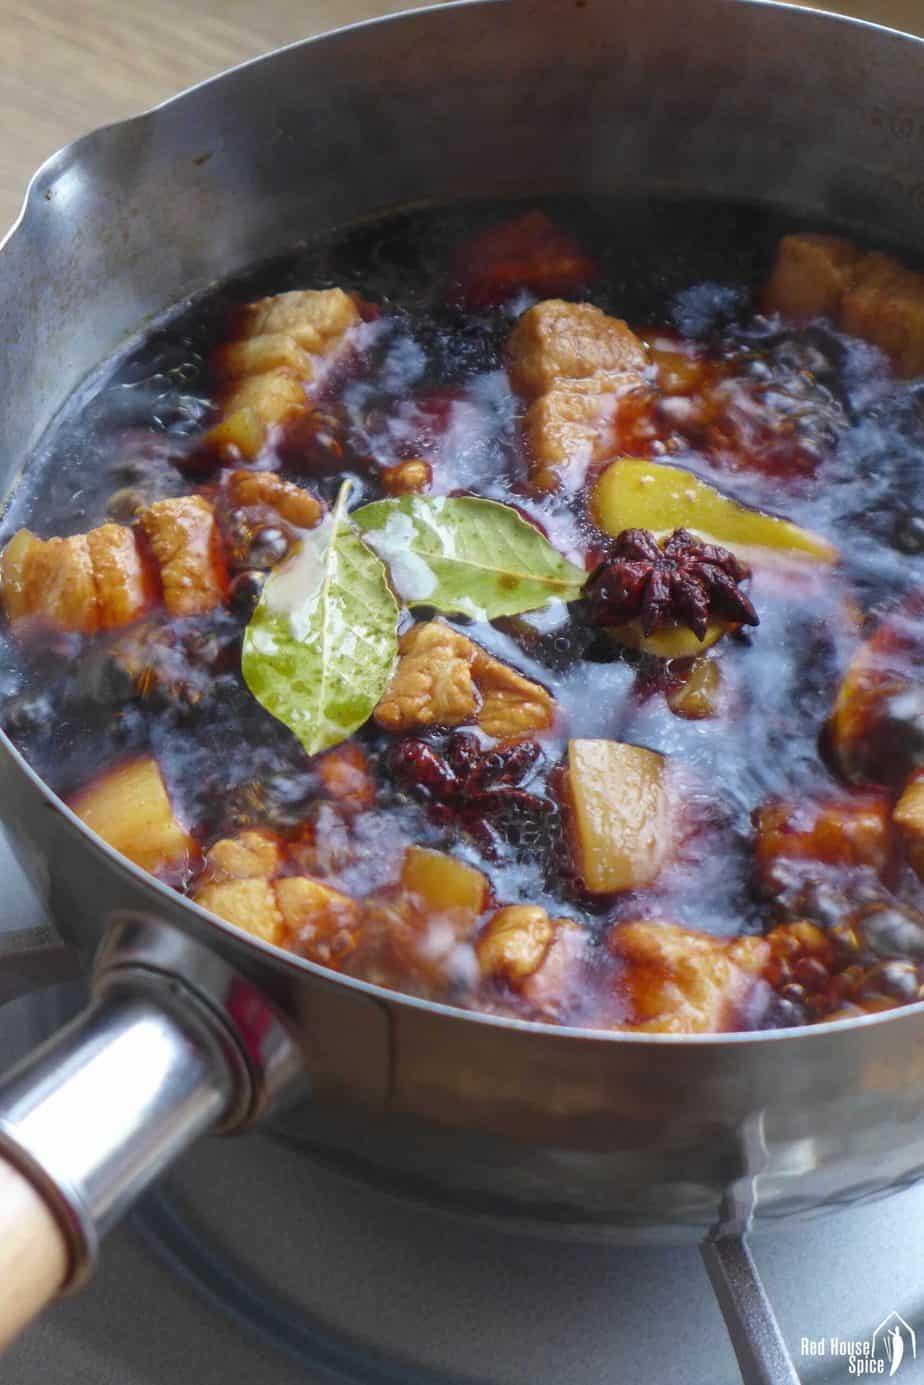 boiling pork chunks in a dark broth